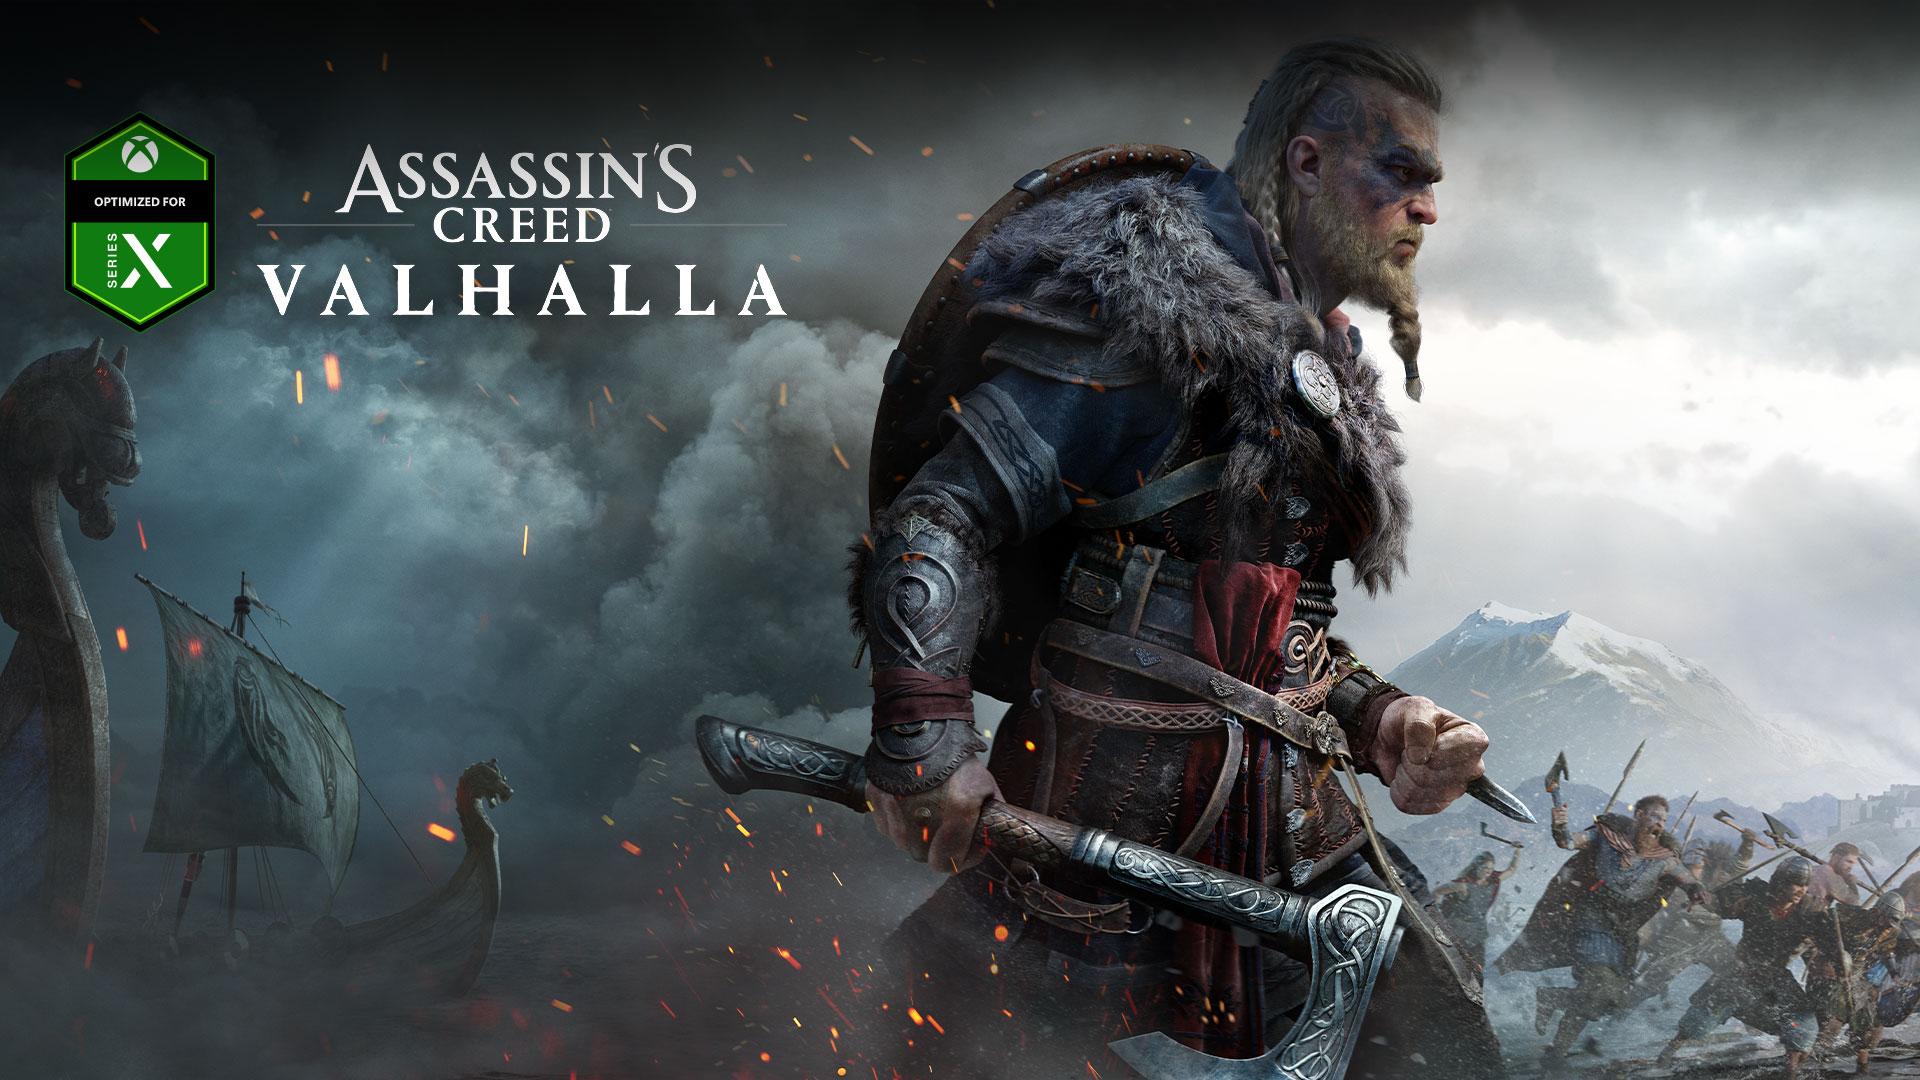 Optimized for Xbox Series X ロゴ、Assassin's Creed Valhalla、斧を持ったキャラクター、霧の中の船、バトル